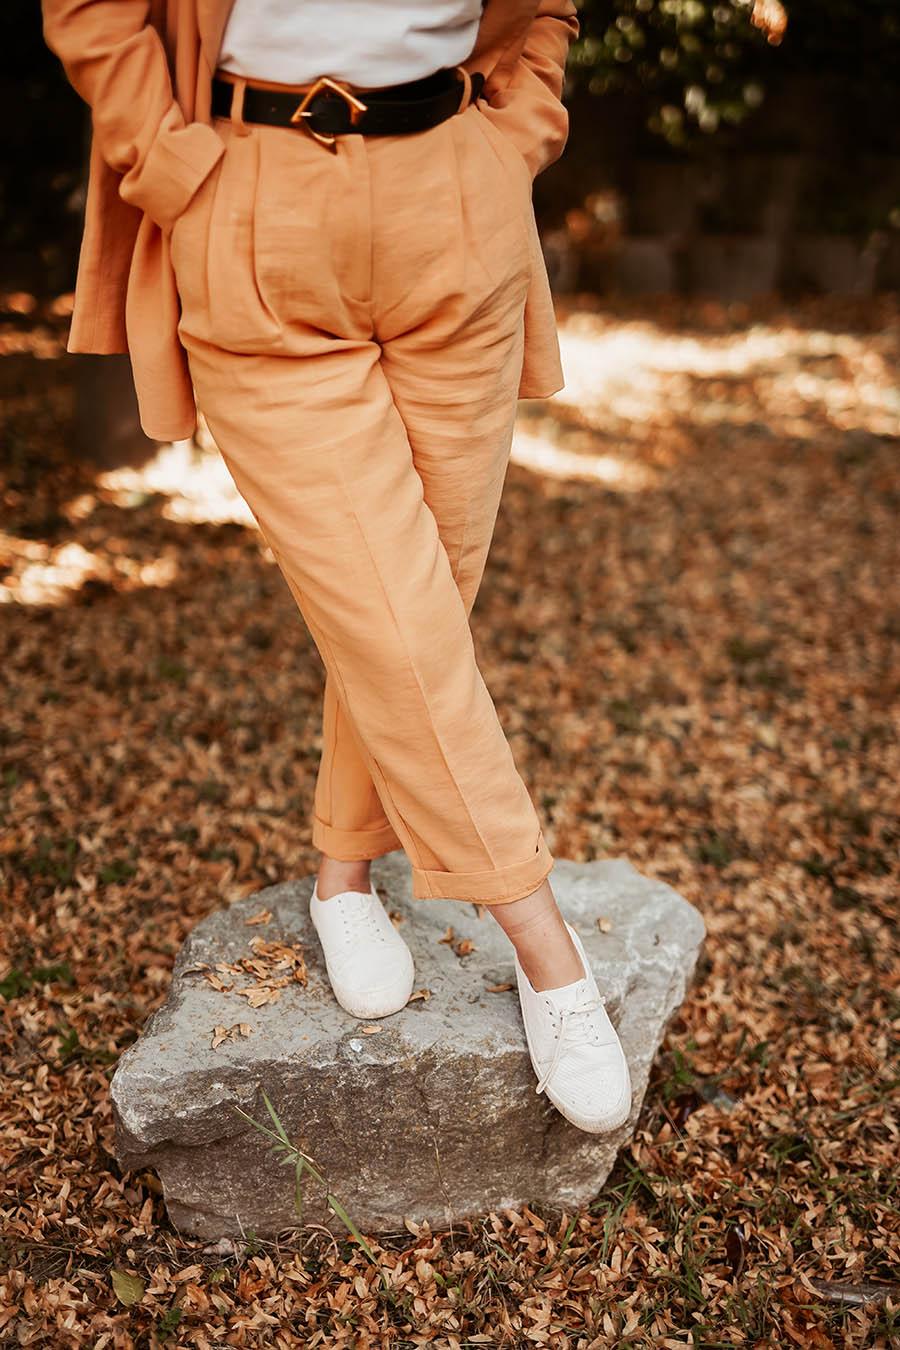 Weiße-Sneaker-Outfit-Look